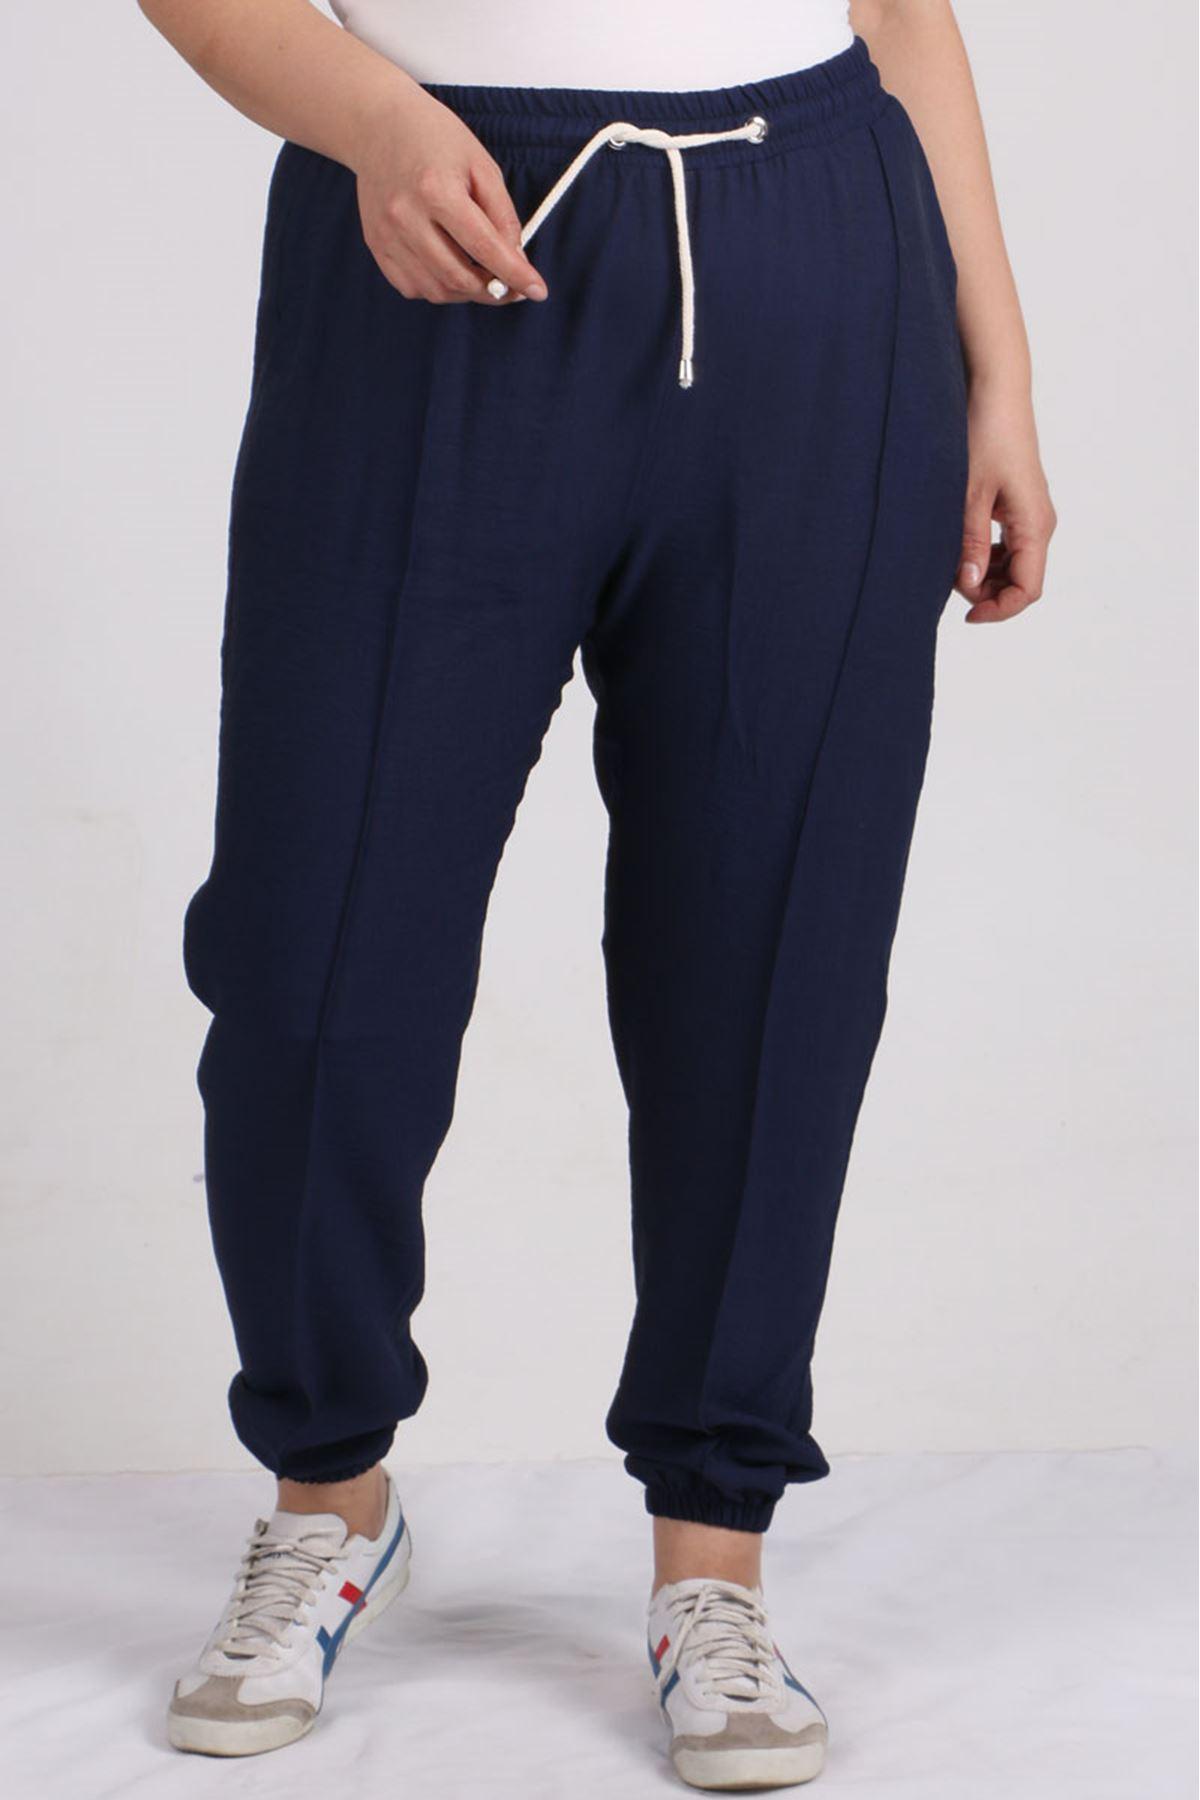 9147 Plus Size Elastic Waist Pants - Navy blue